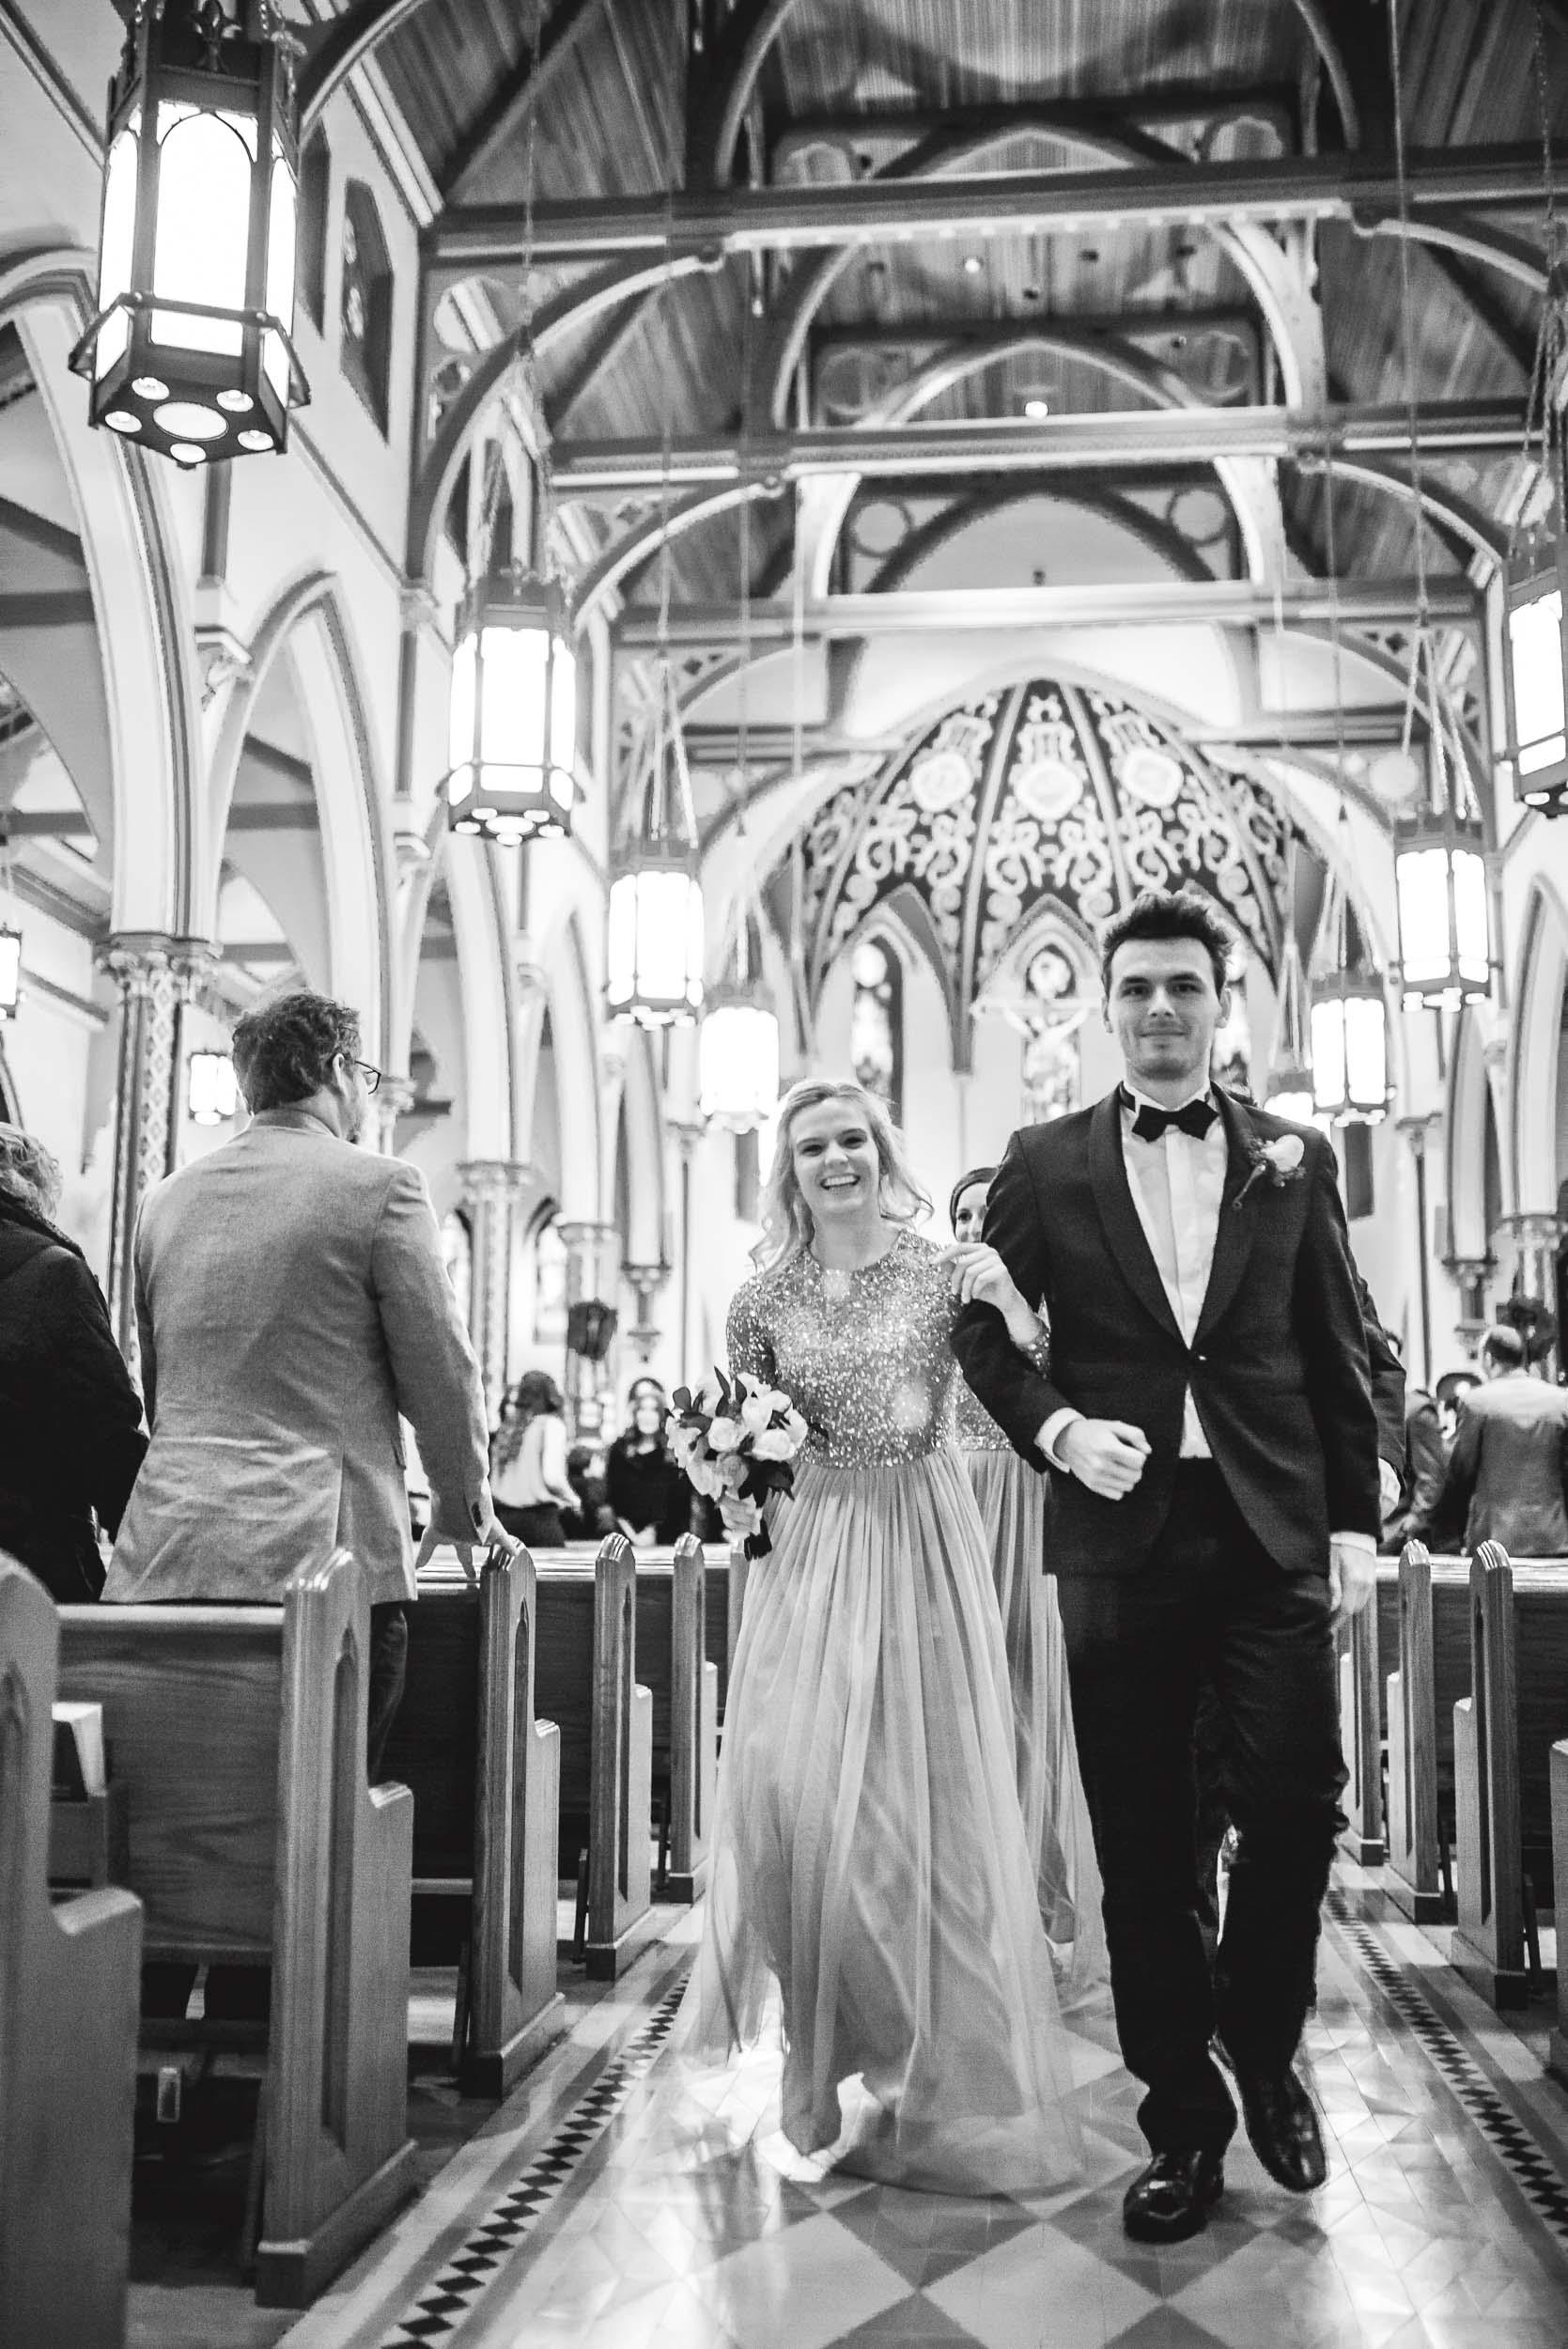 KatieandMathias_Morristown_NewJersey_Wedding_Church_Assumption_Madison_Hotel(40of65).jpg